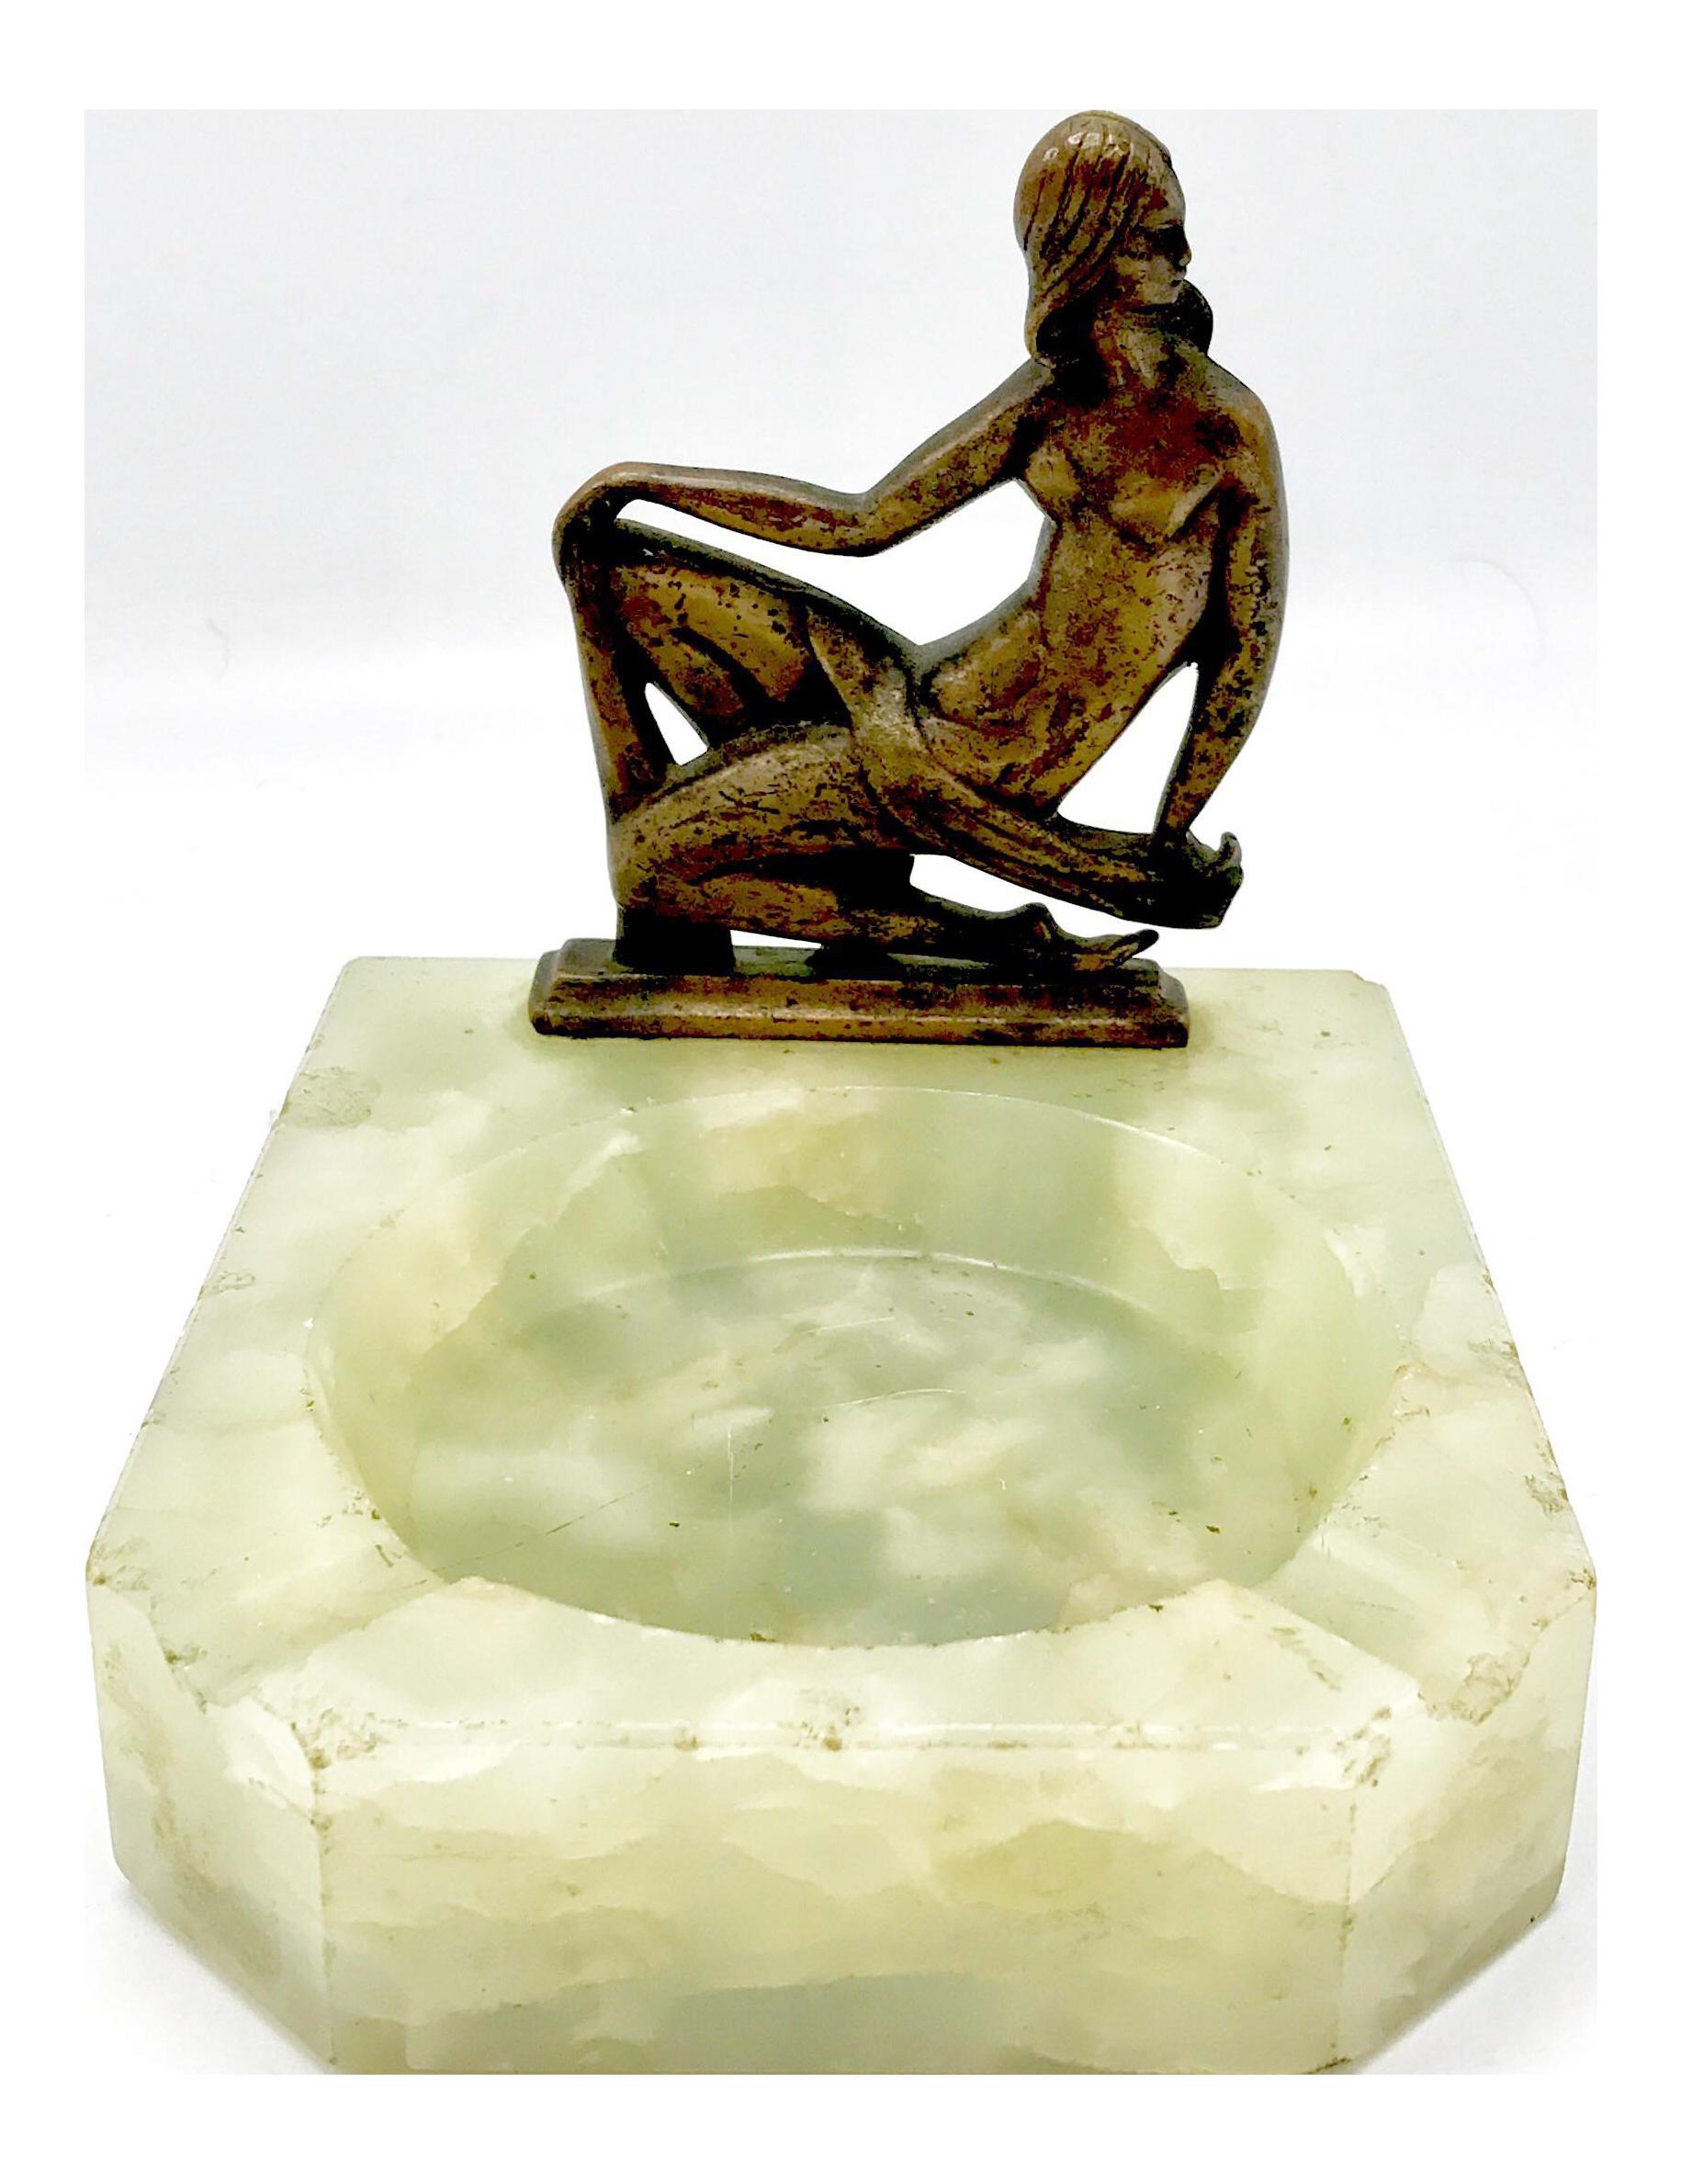 Art Deco Alabaster Ashtray With Nude Bronze Female Figure | Chairish